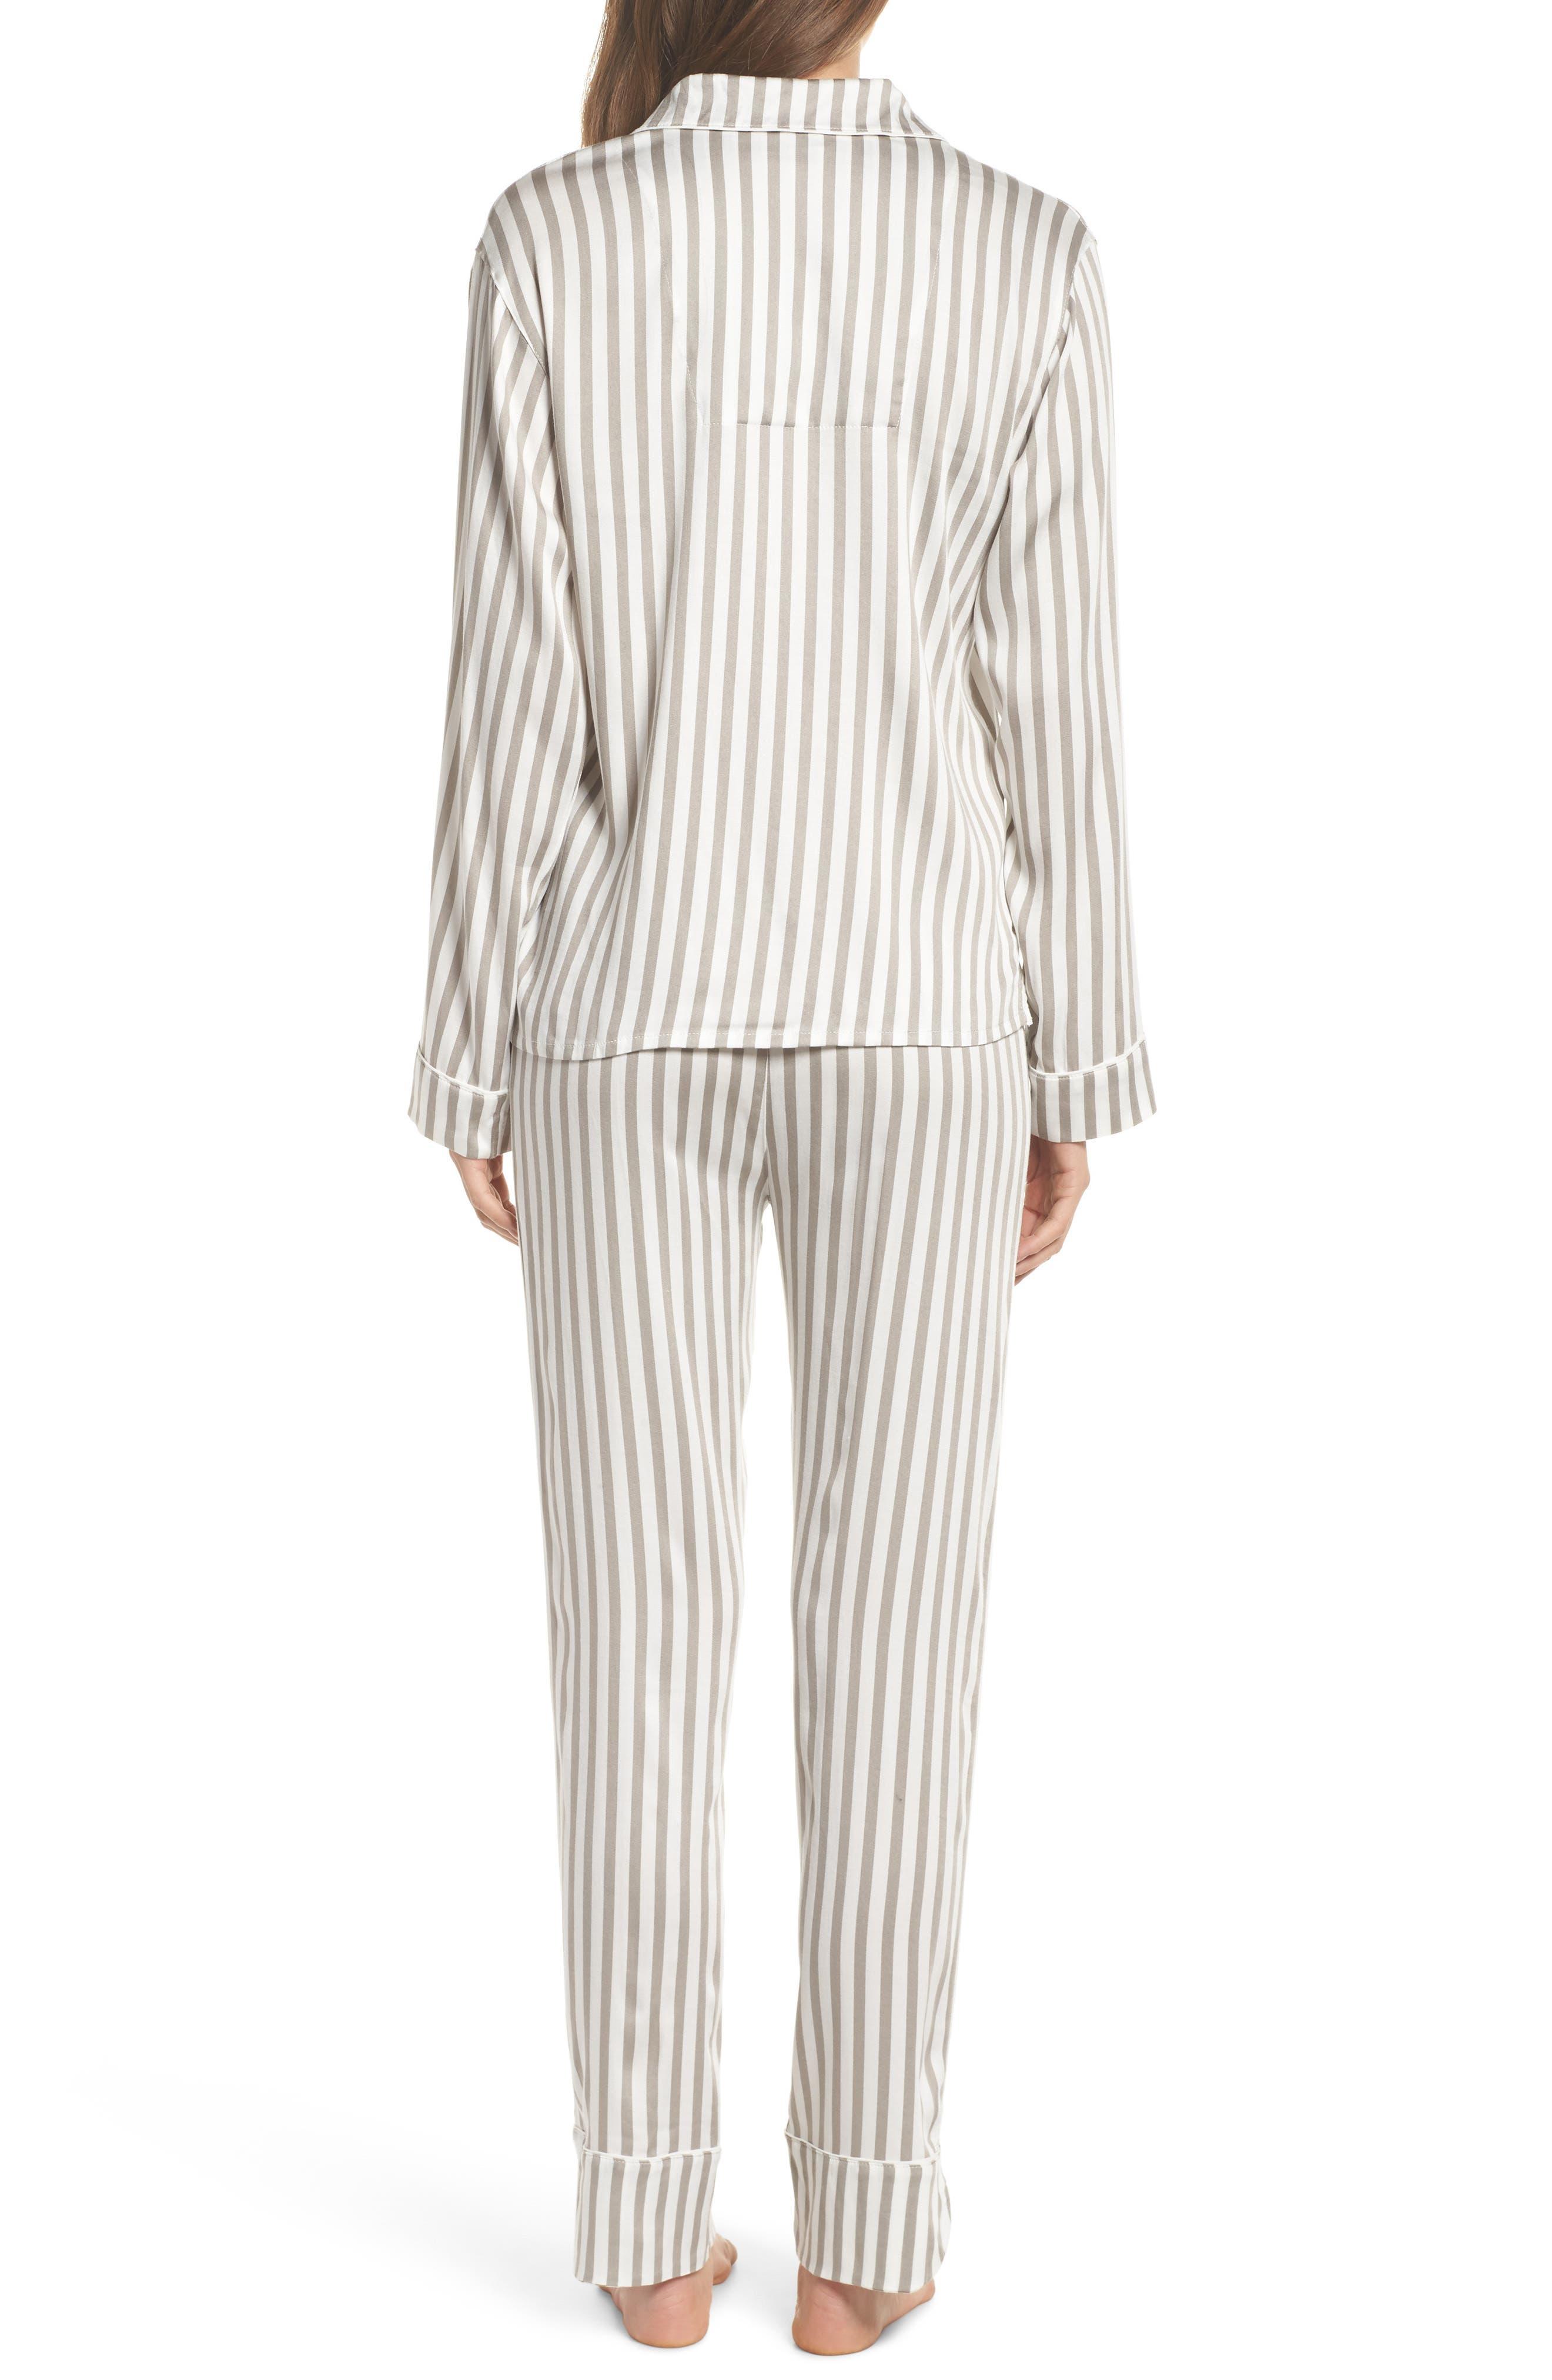 Stripe Pajamas,                             Alternate thumbnail 2, color,                             020